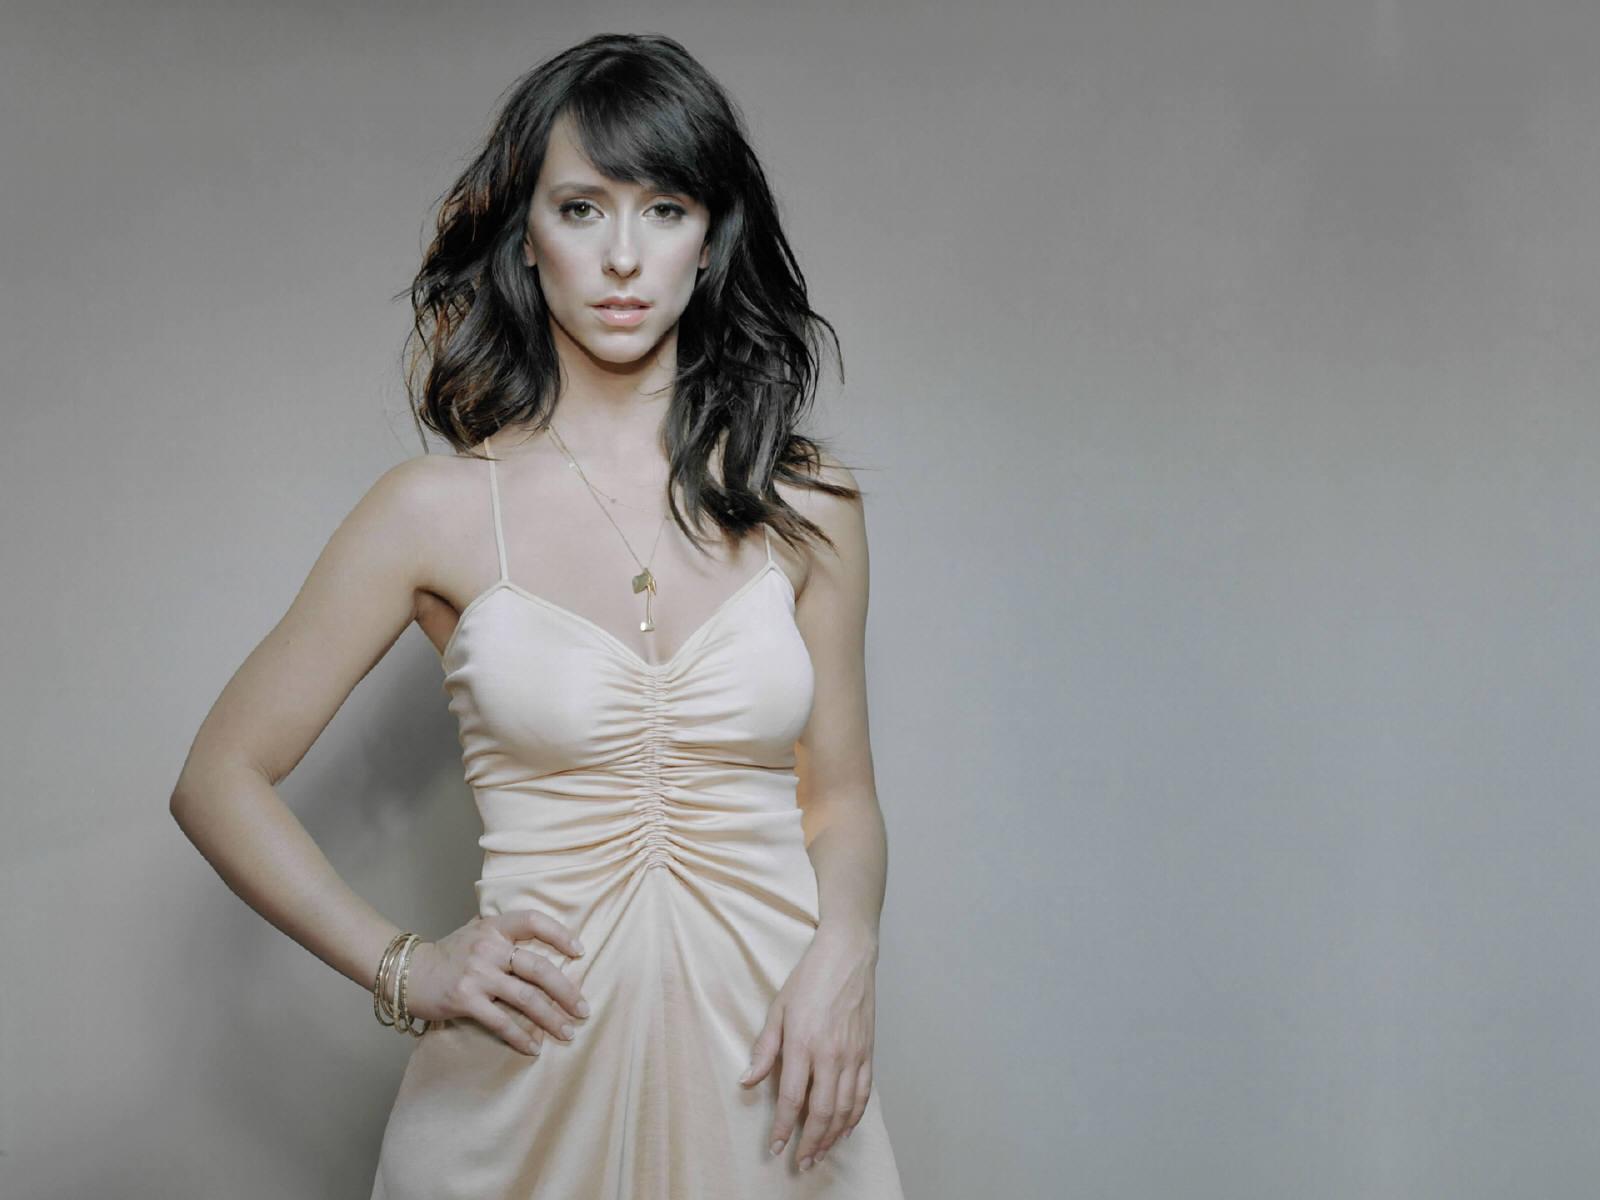 Hollywood celebrities jennifer love hewitt wallpapers - J love wallpaper download ...